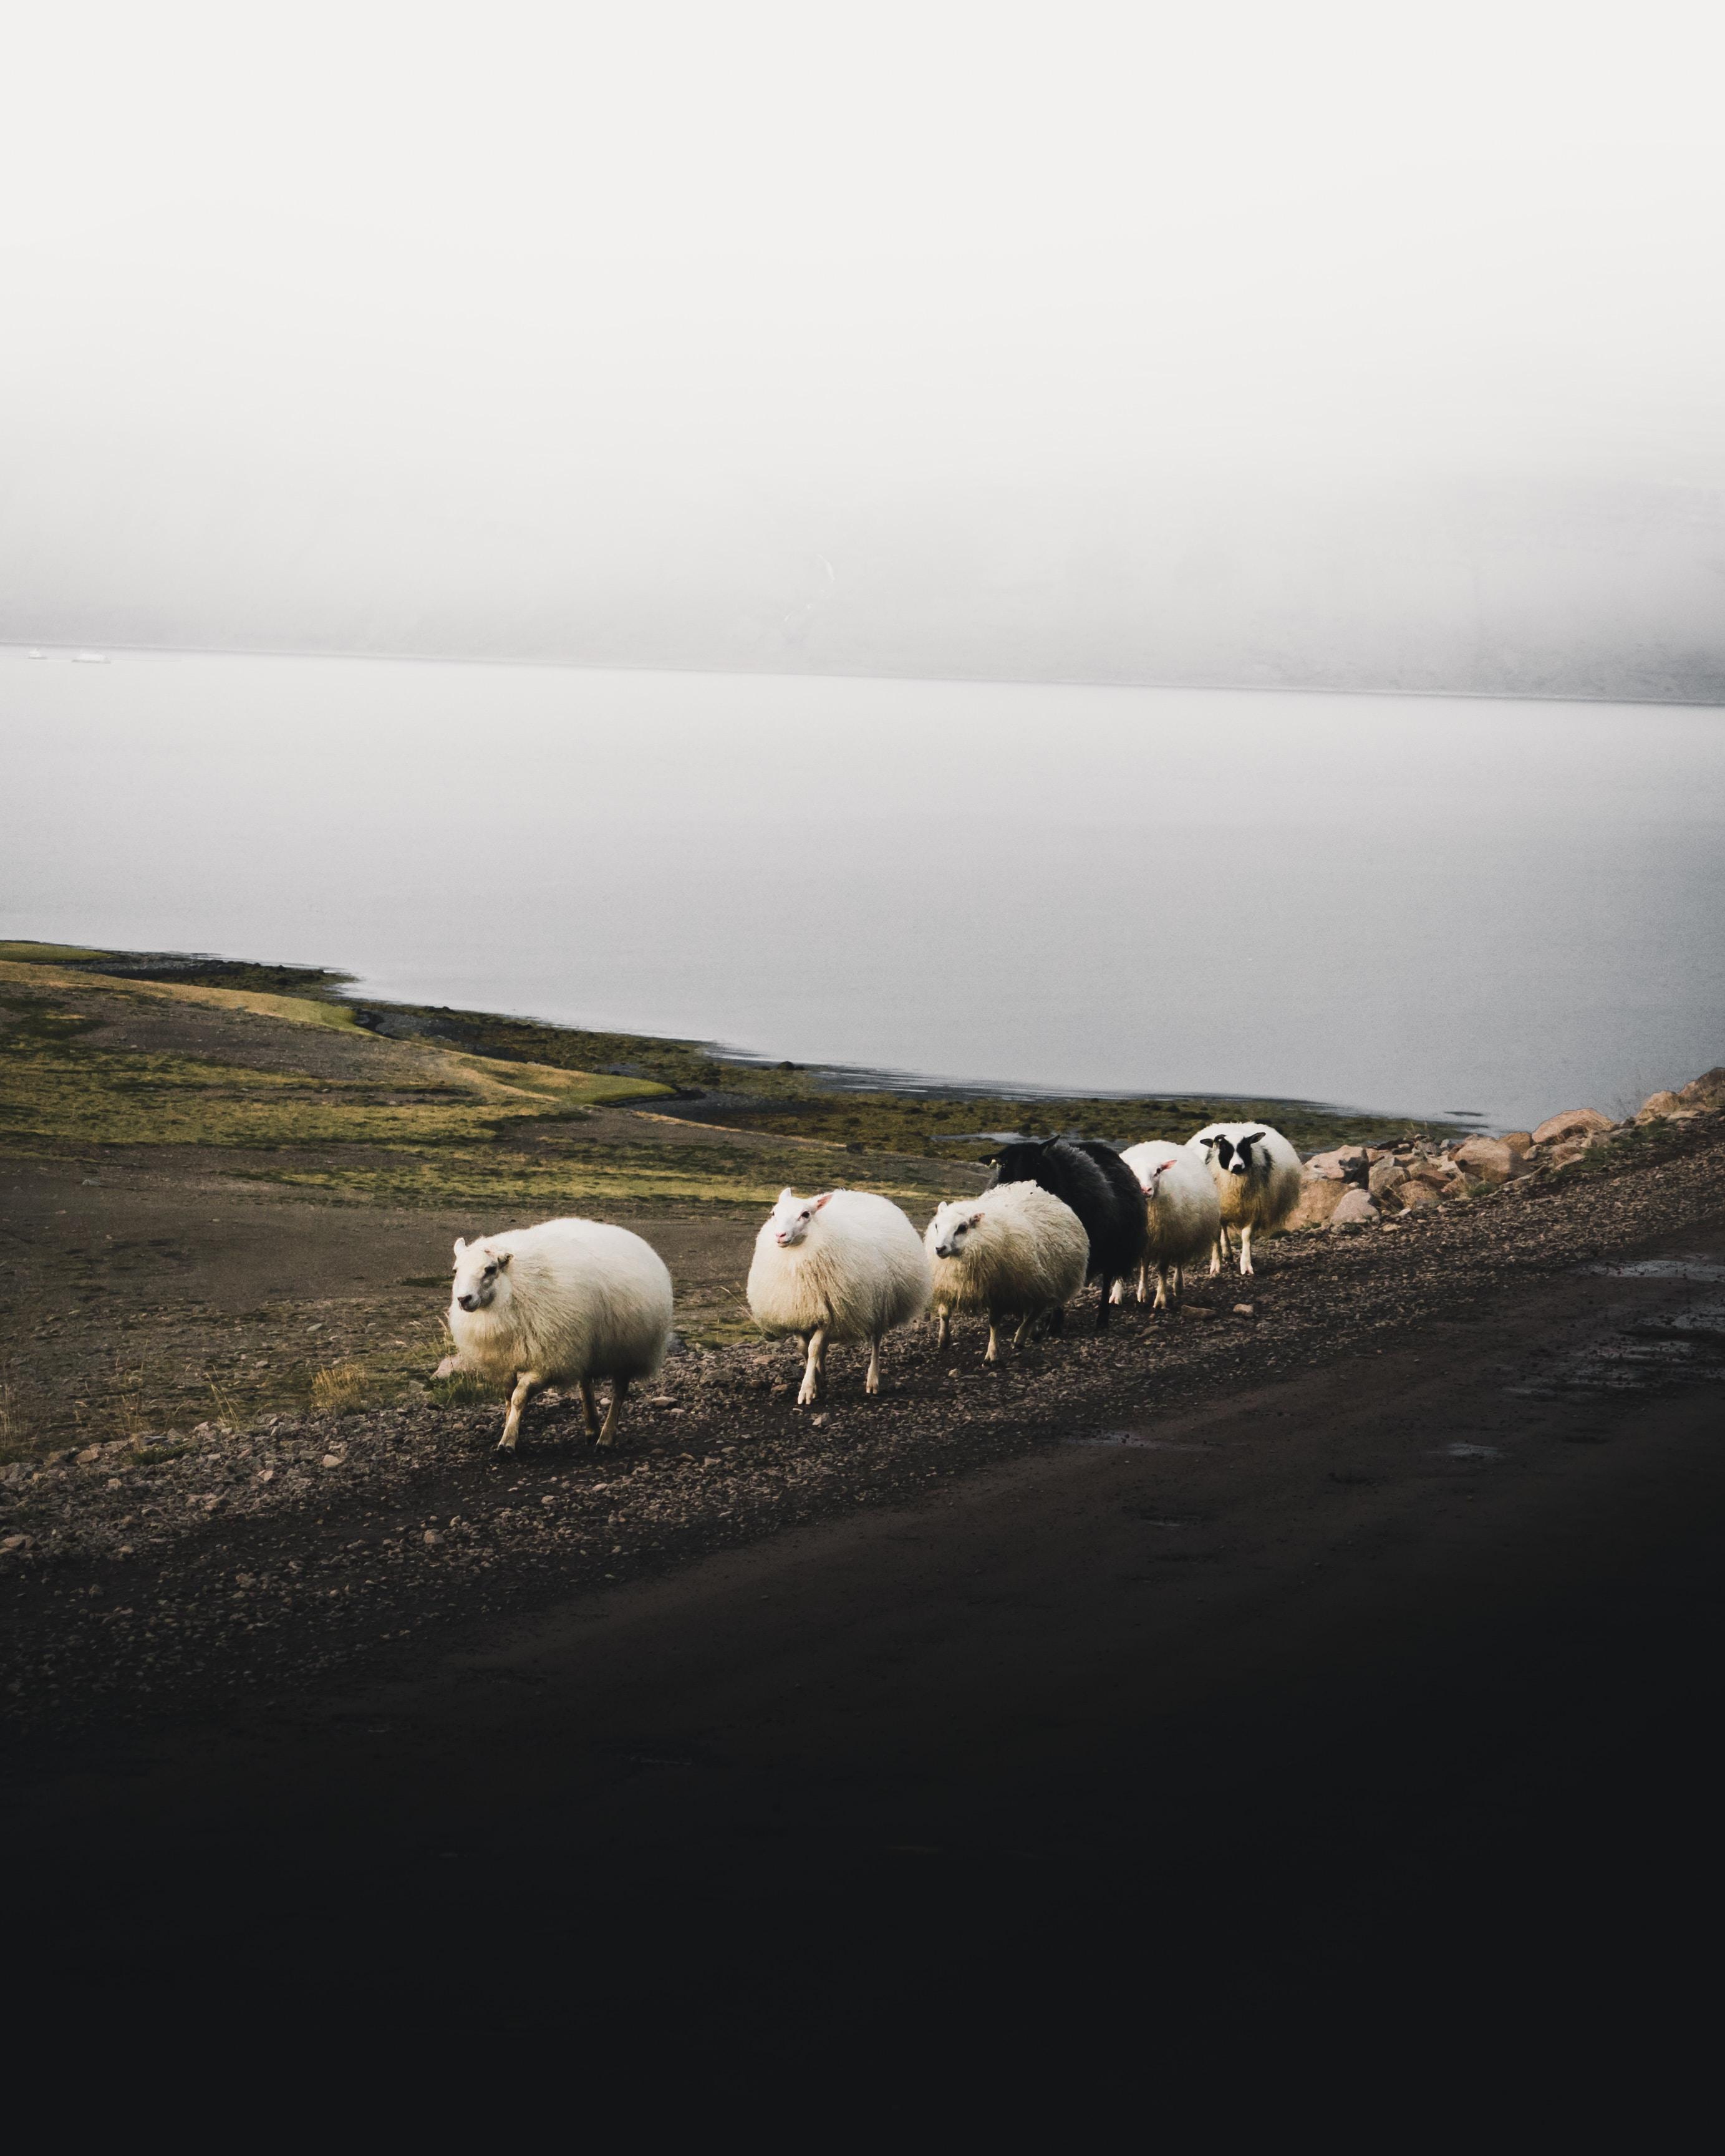 white sheep falling in line near body of water